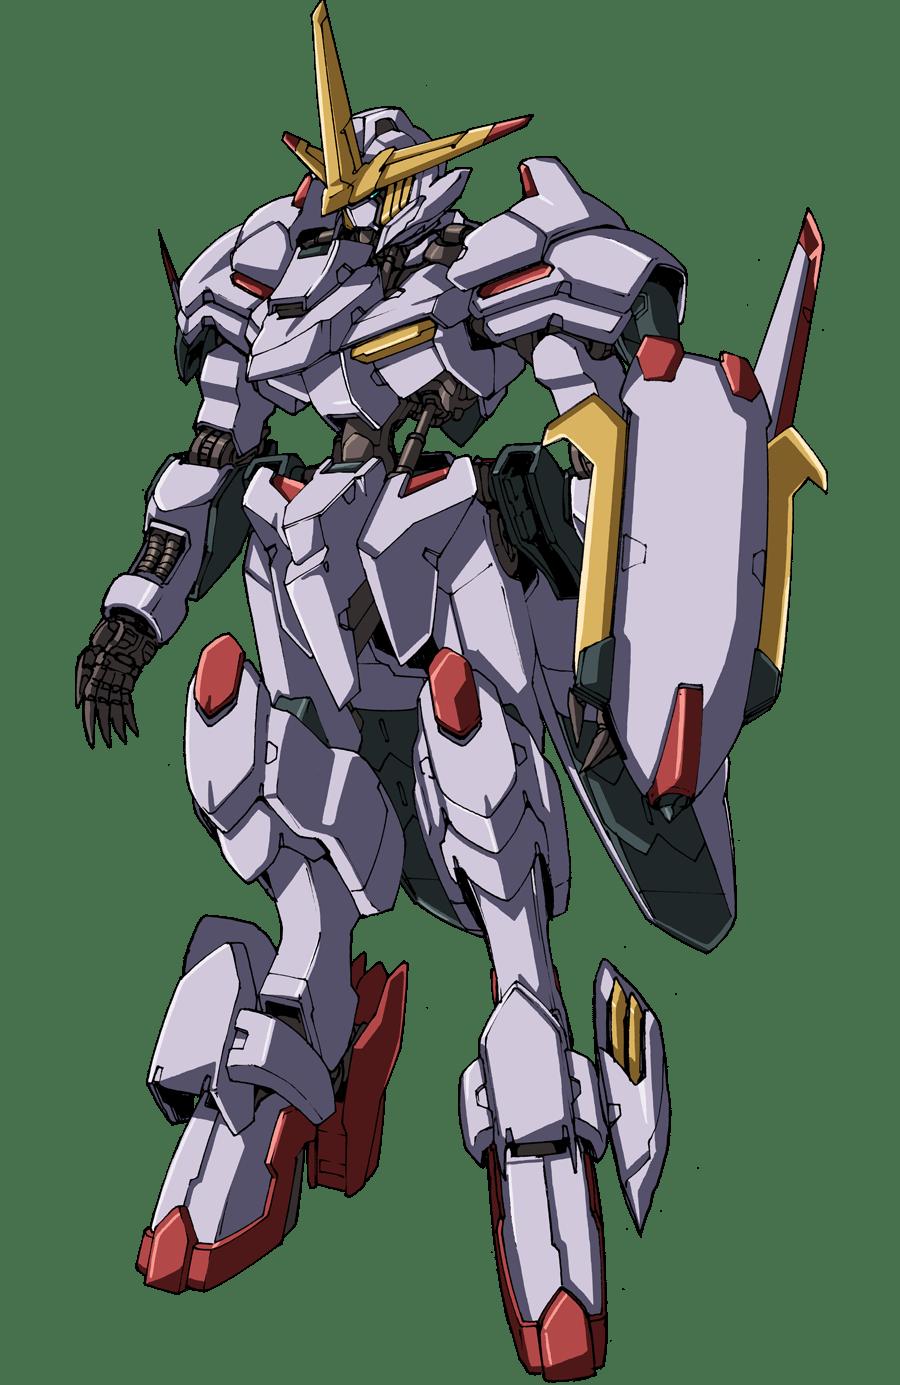 Pin by DOŃÑ on Gundam Gundam iron blooded orphans